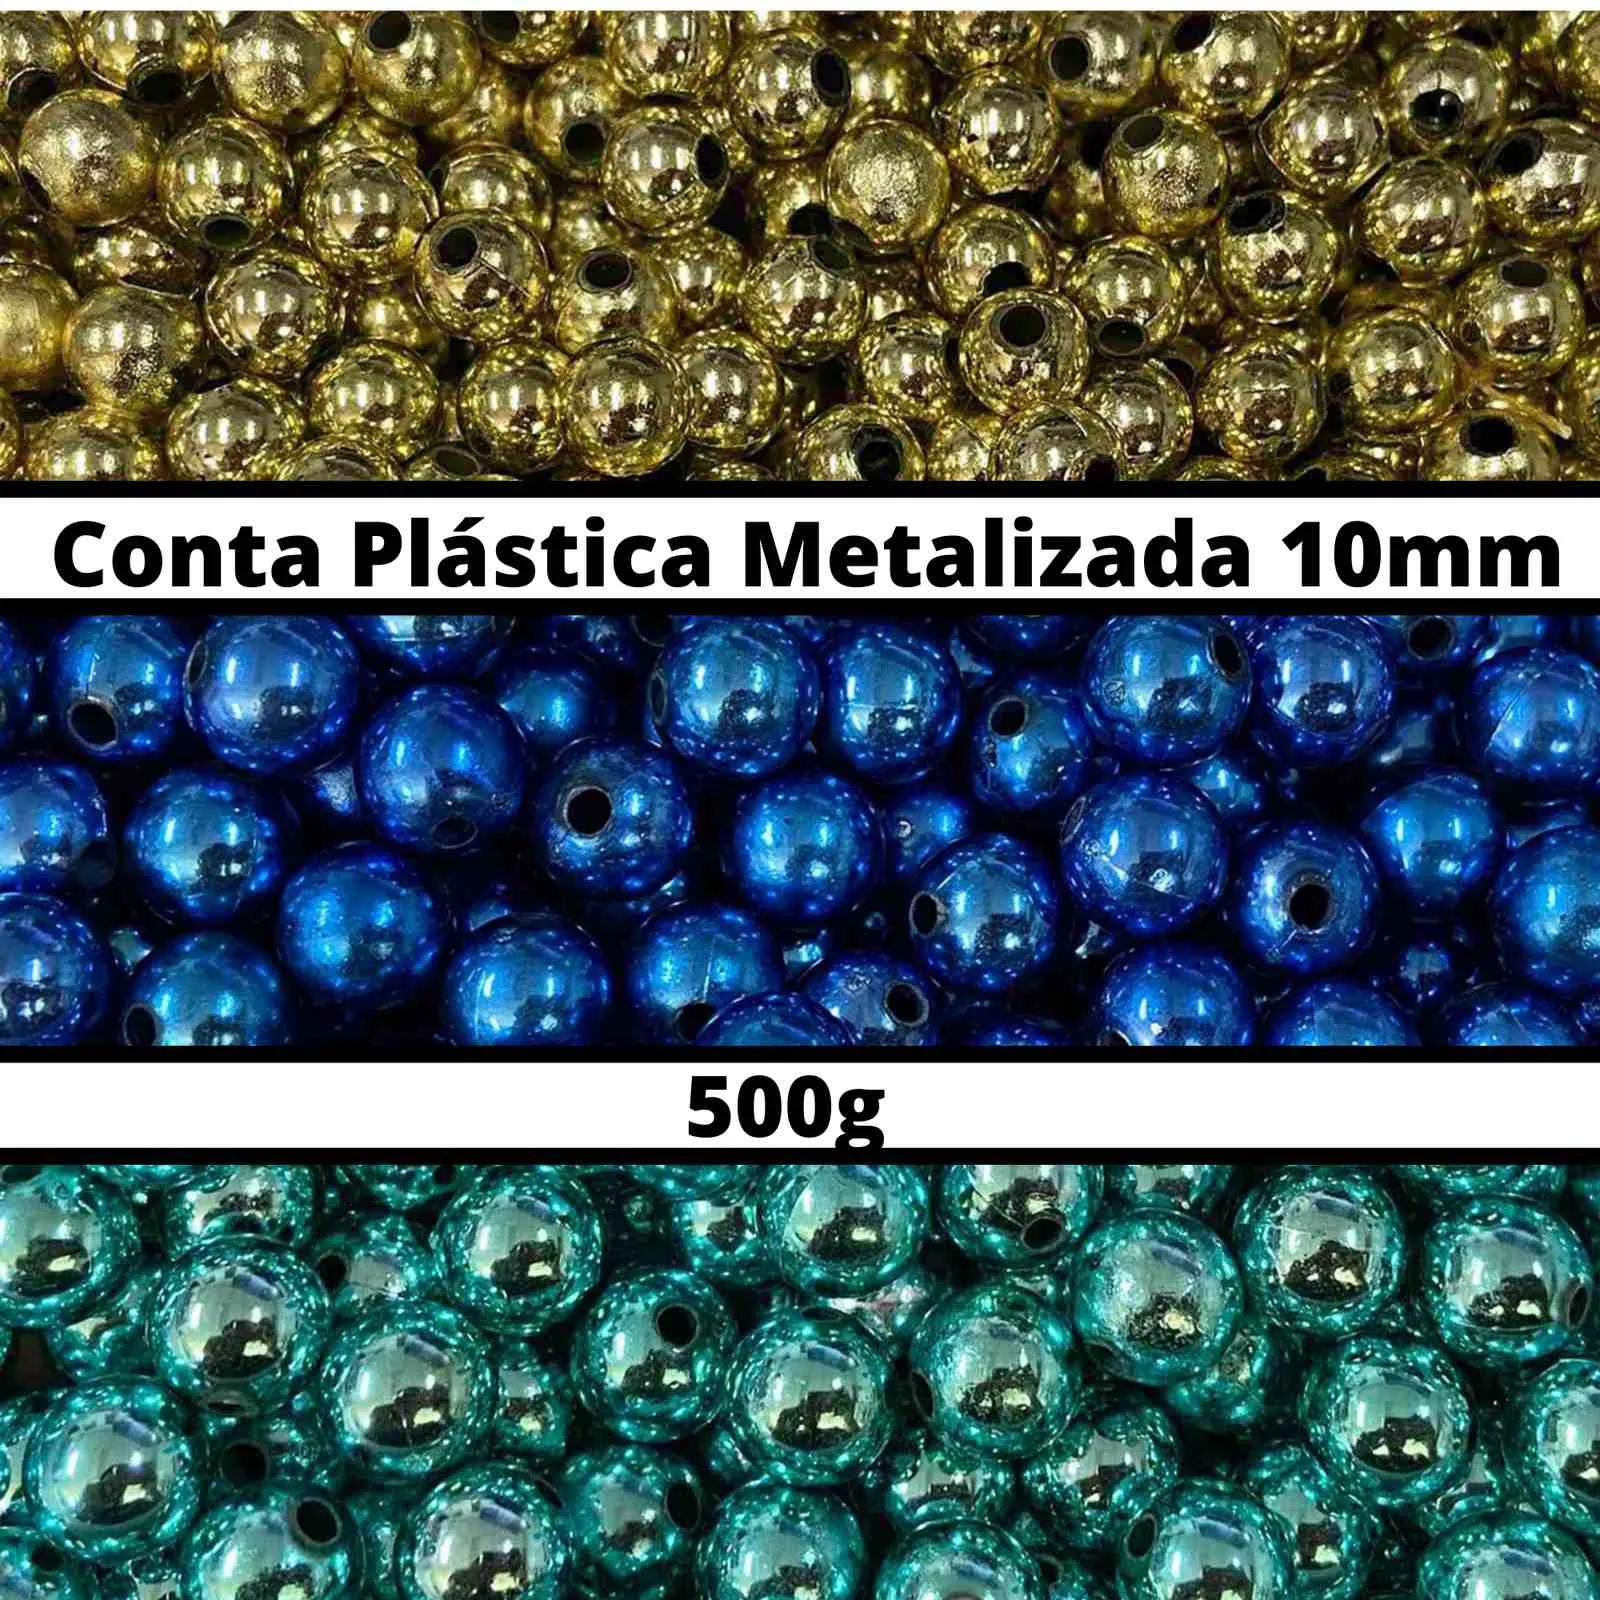 Conta Plástica Metalizada 10mm - 500g